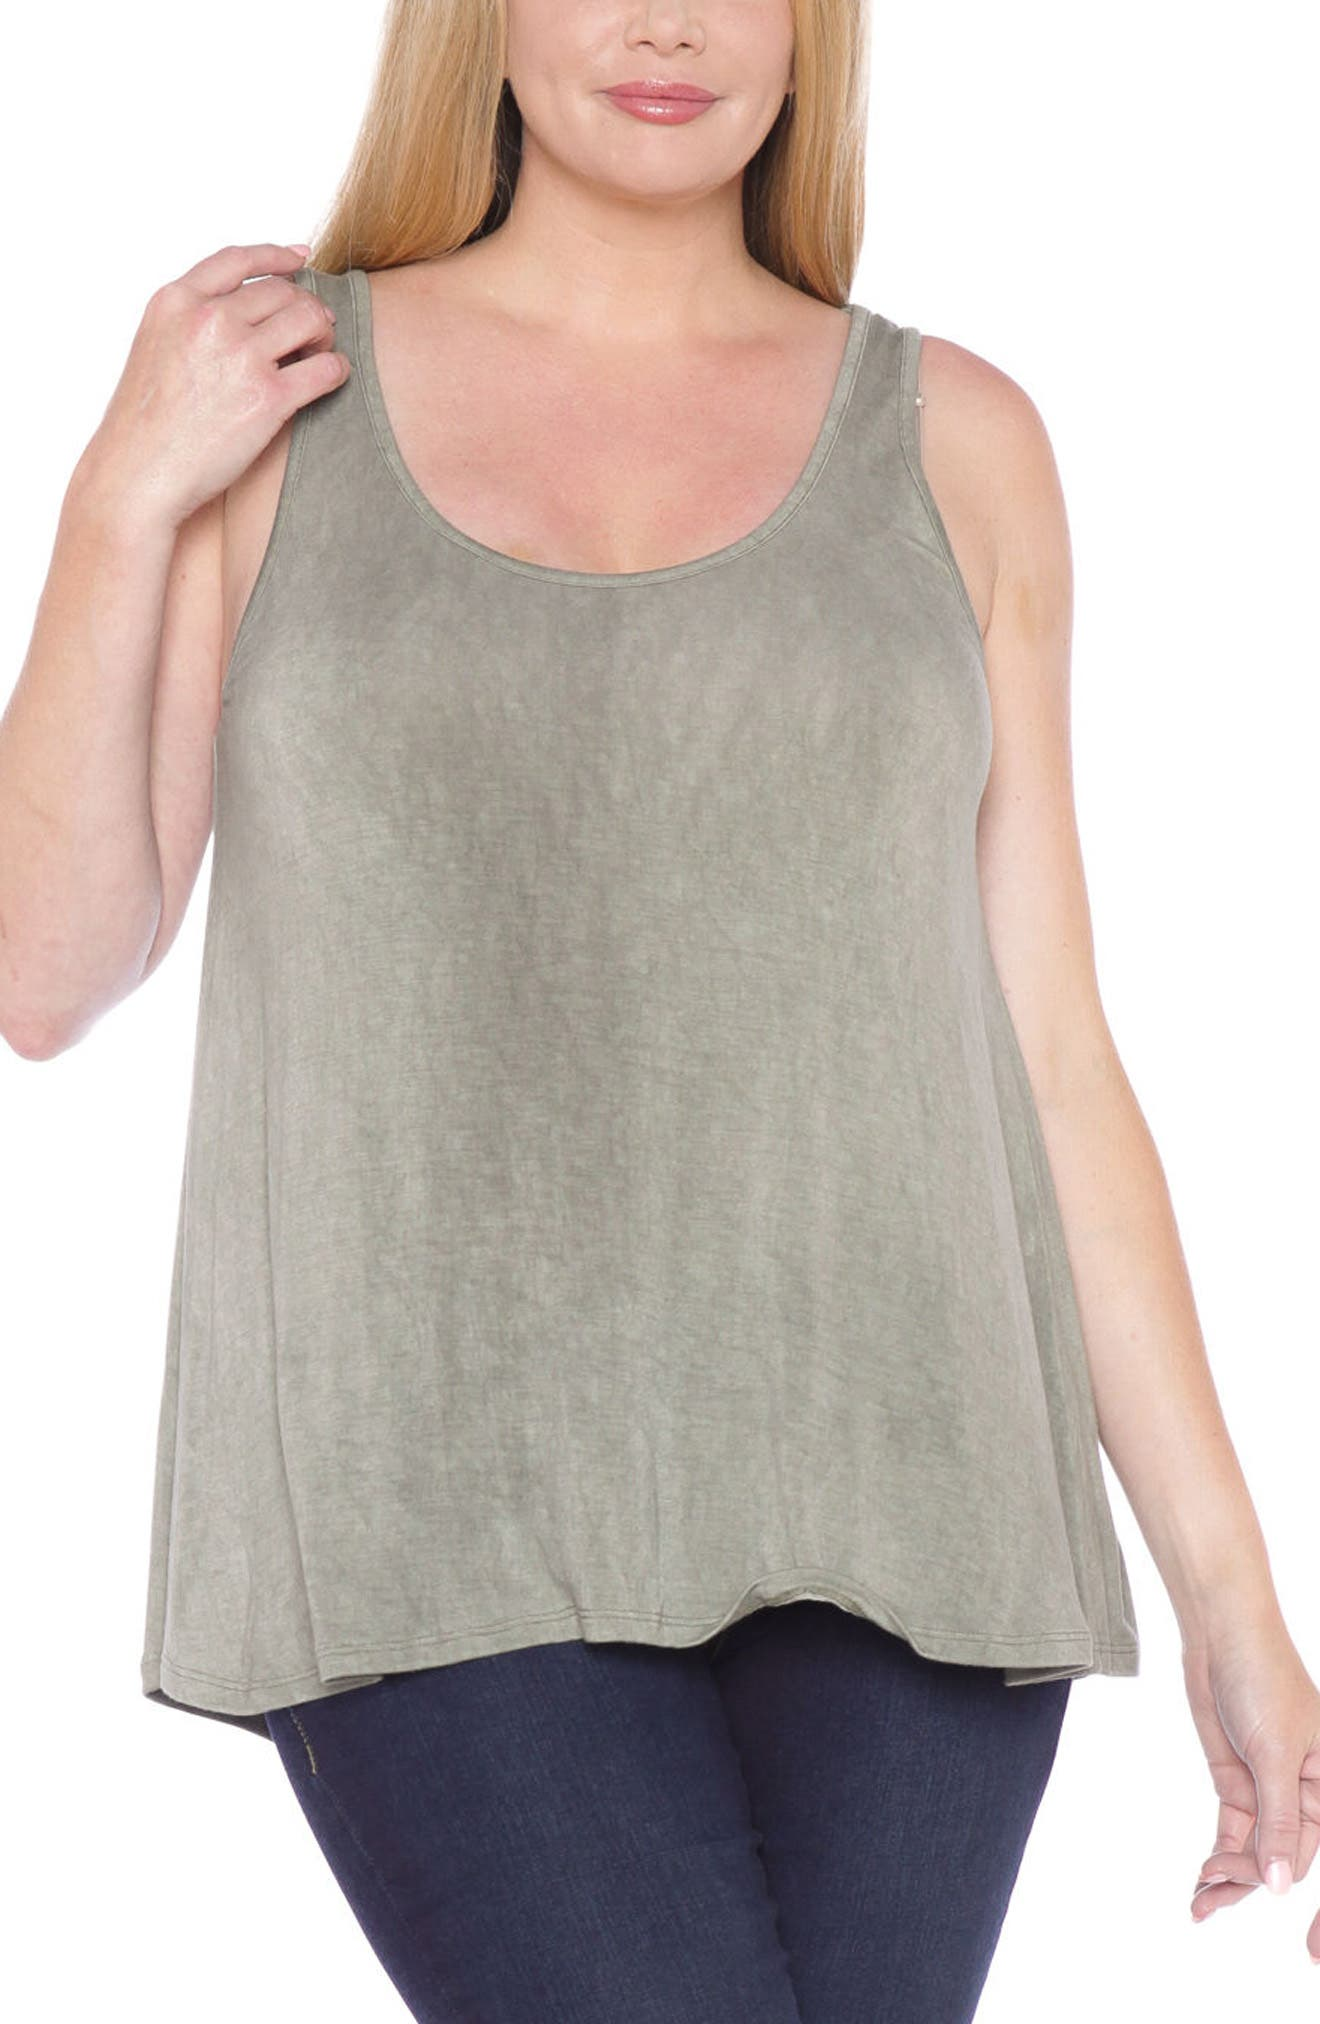 Alternate Image 1 Selected - SLINK Jeans Scoop Neck Tank Top (Plus Size)